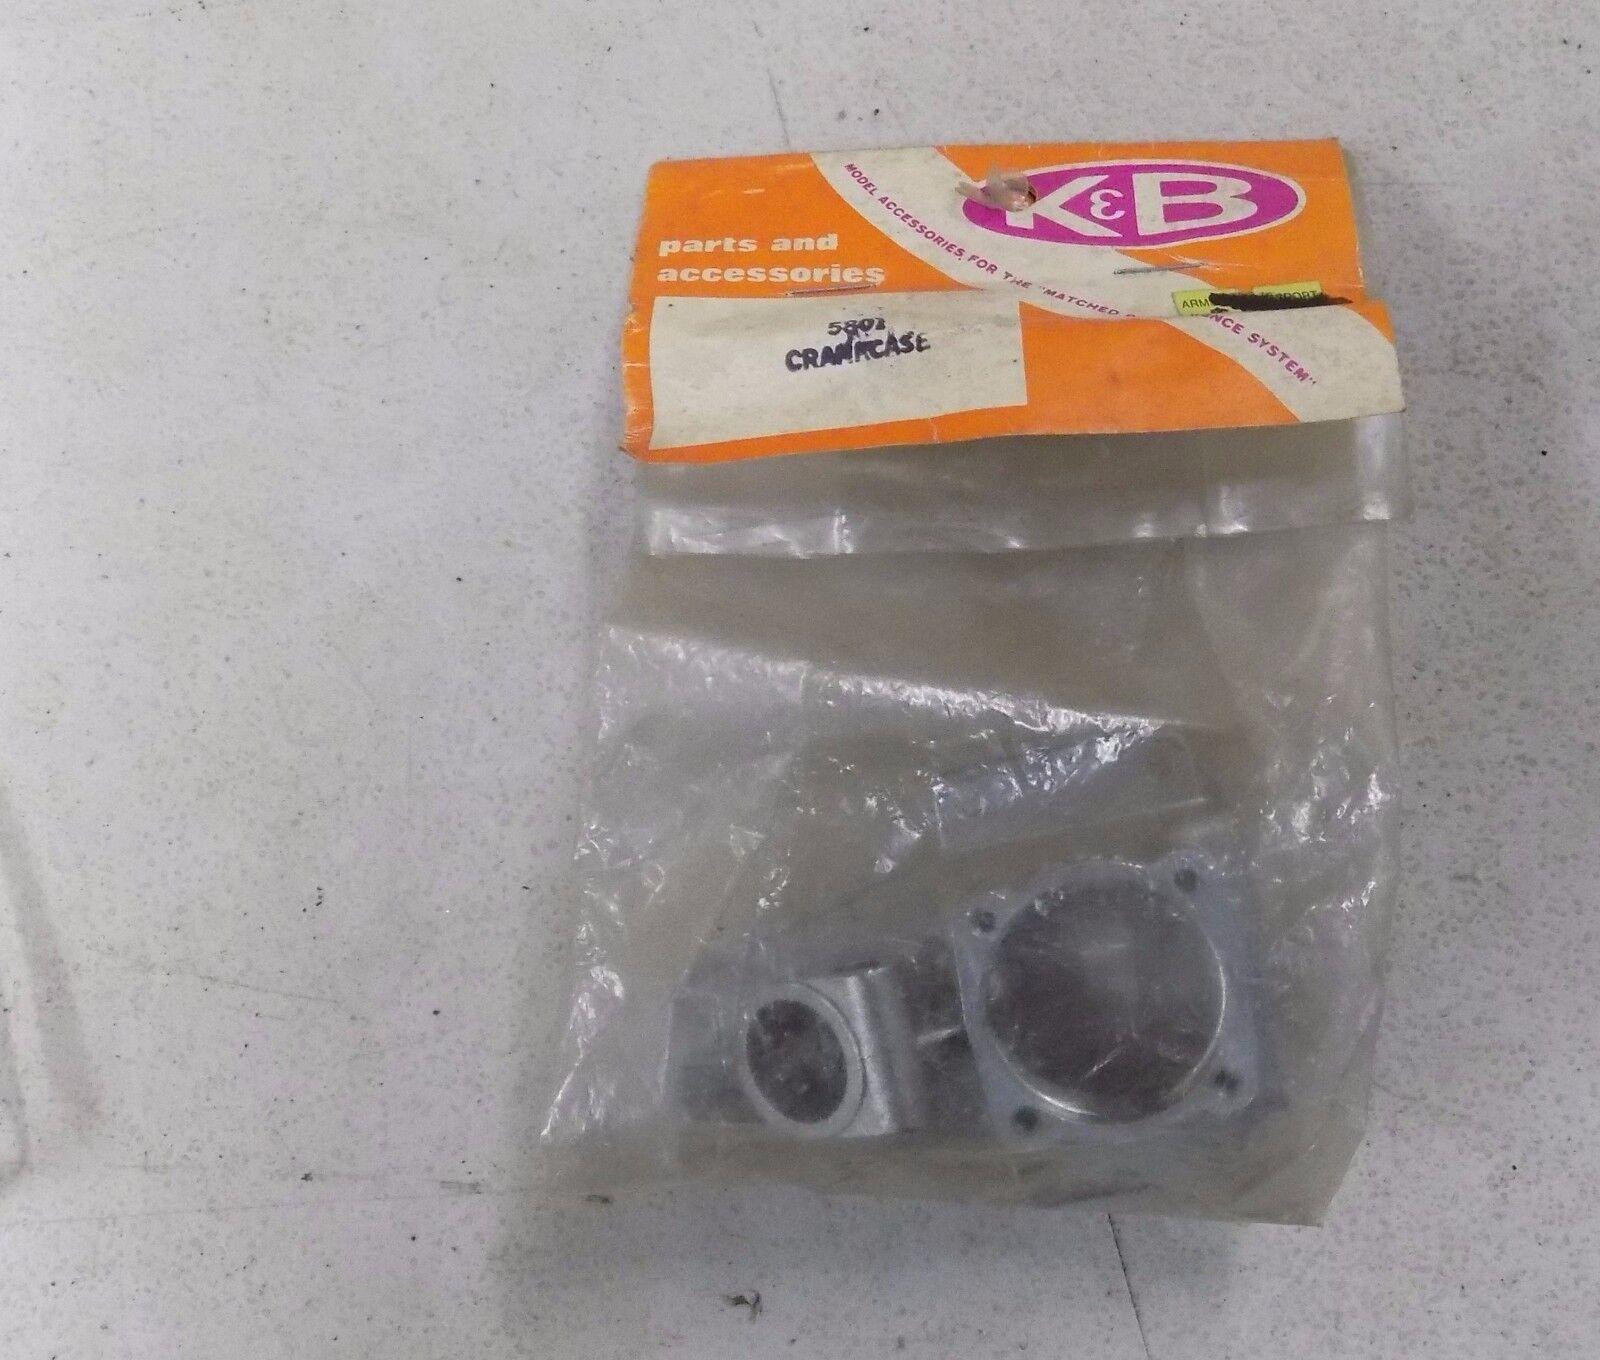 K & B Crankcase 5801 Motor & Engine Parts & Accs